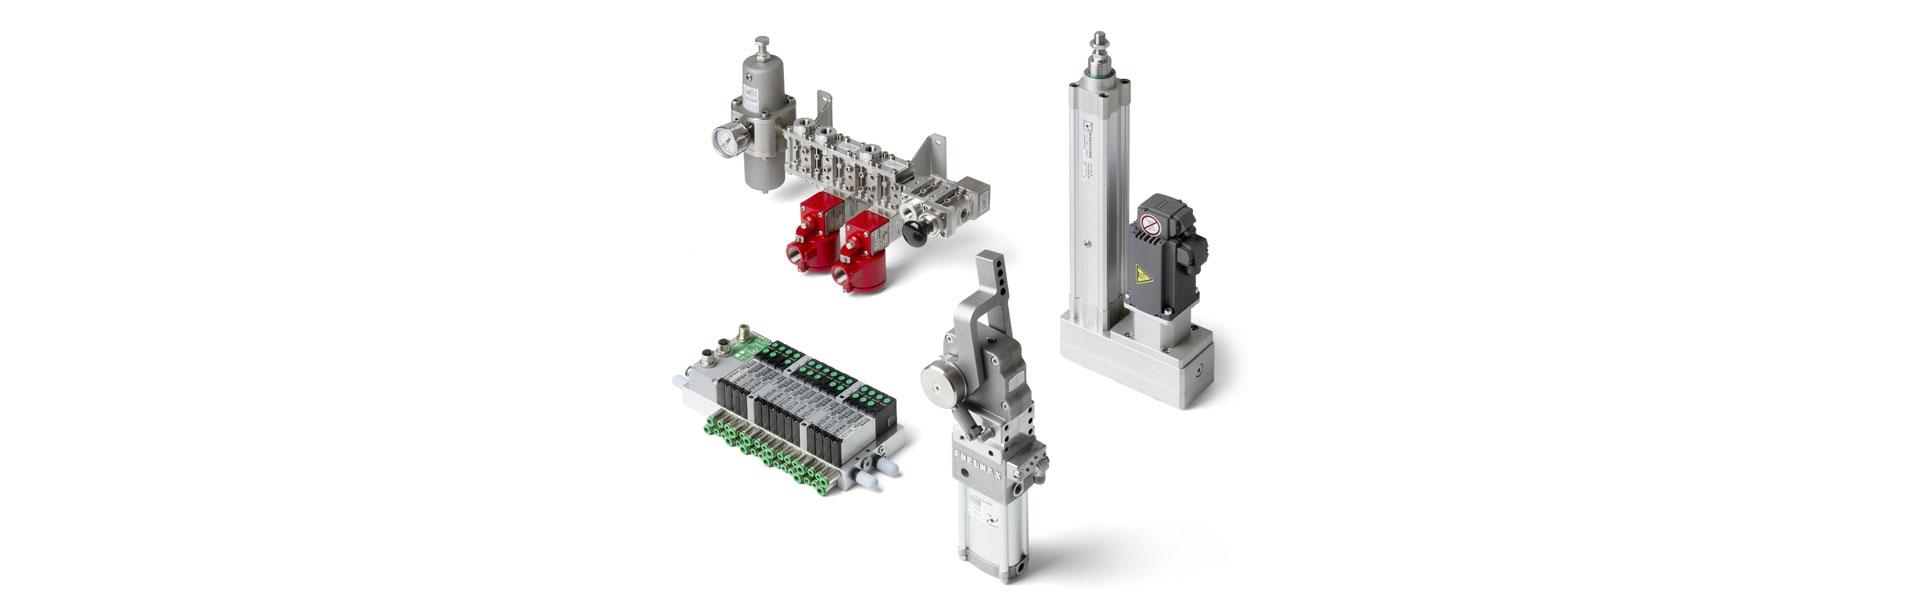 Airfluidcenter